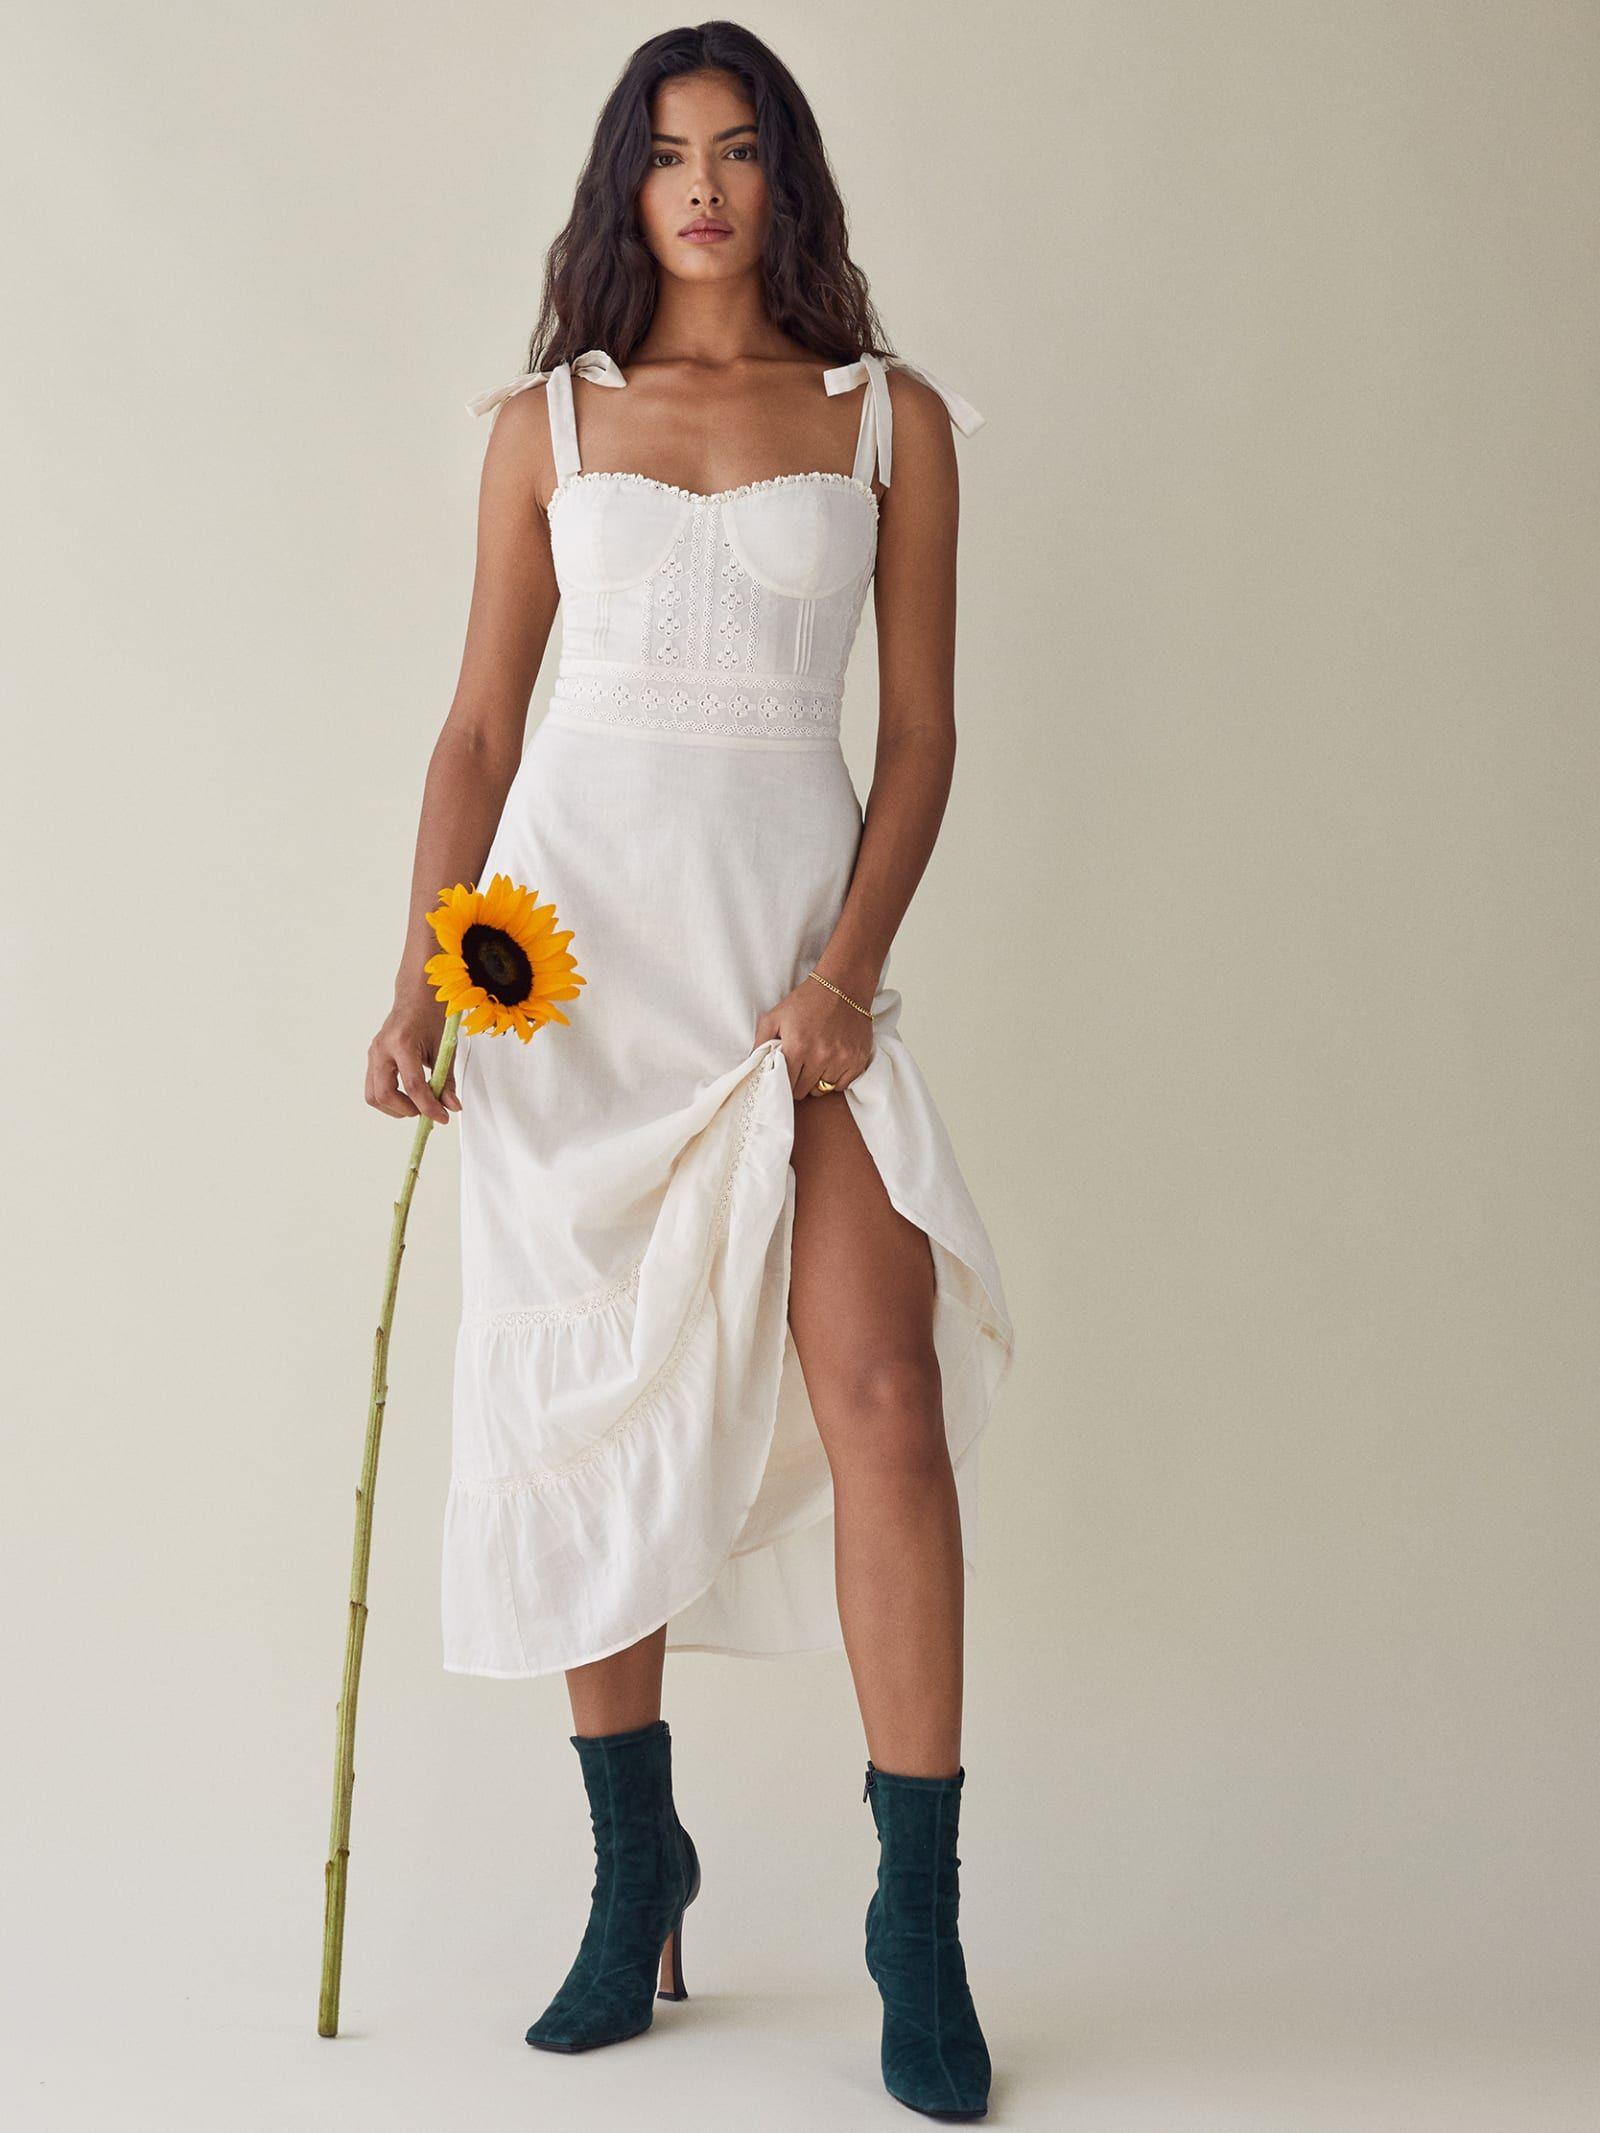 Noa Dress Fancy Attire Dresses Summer Graduation Outfit [ 2133 x 1600 Pixel ]